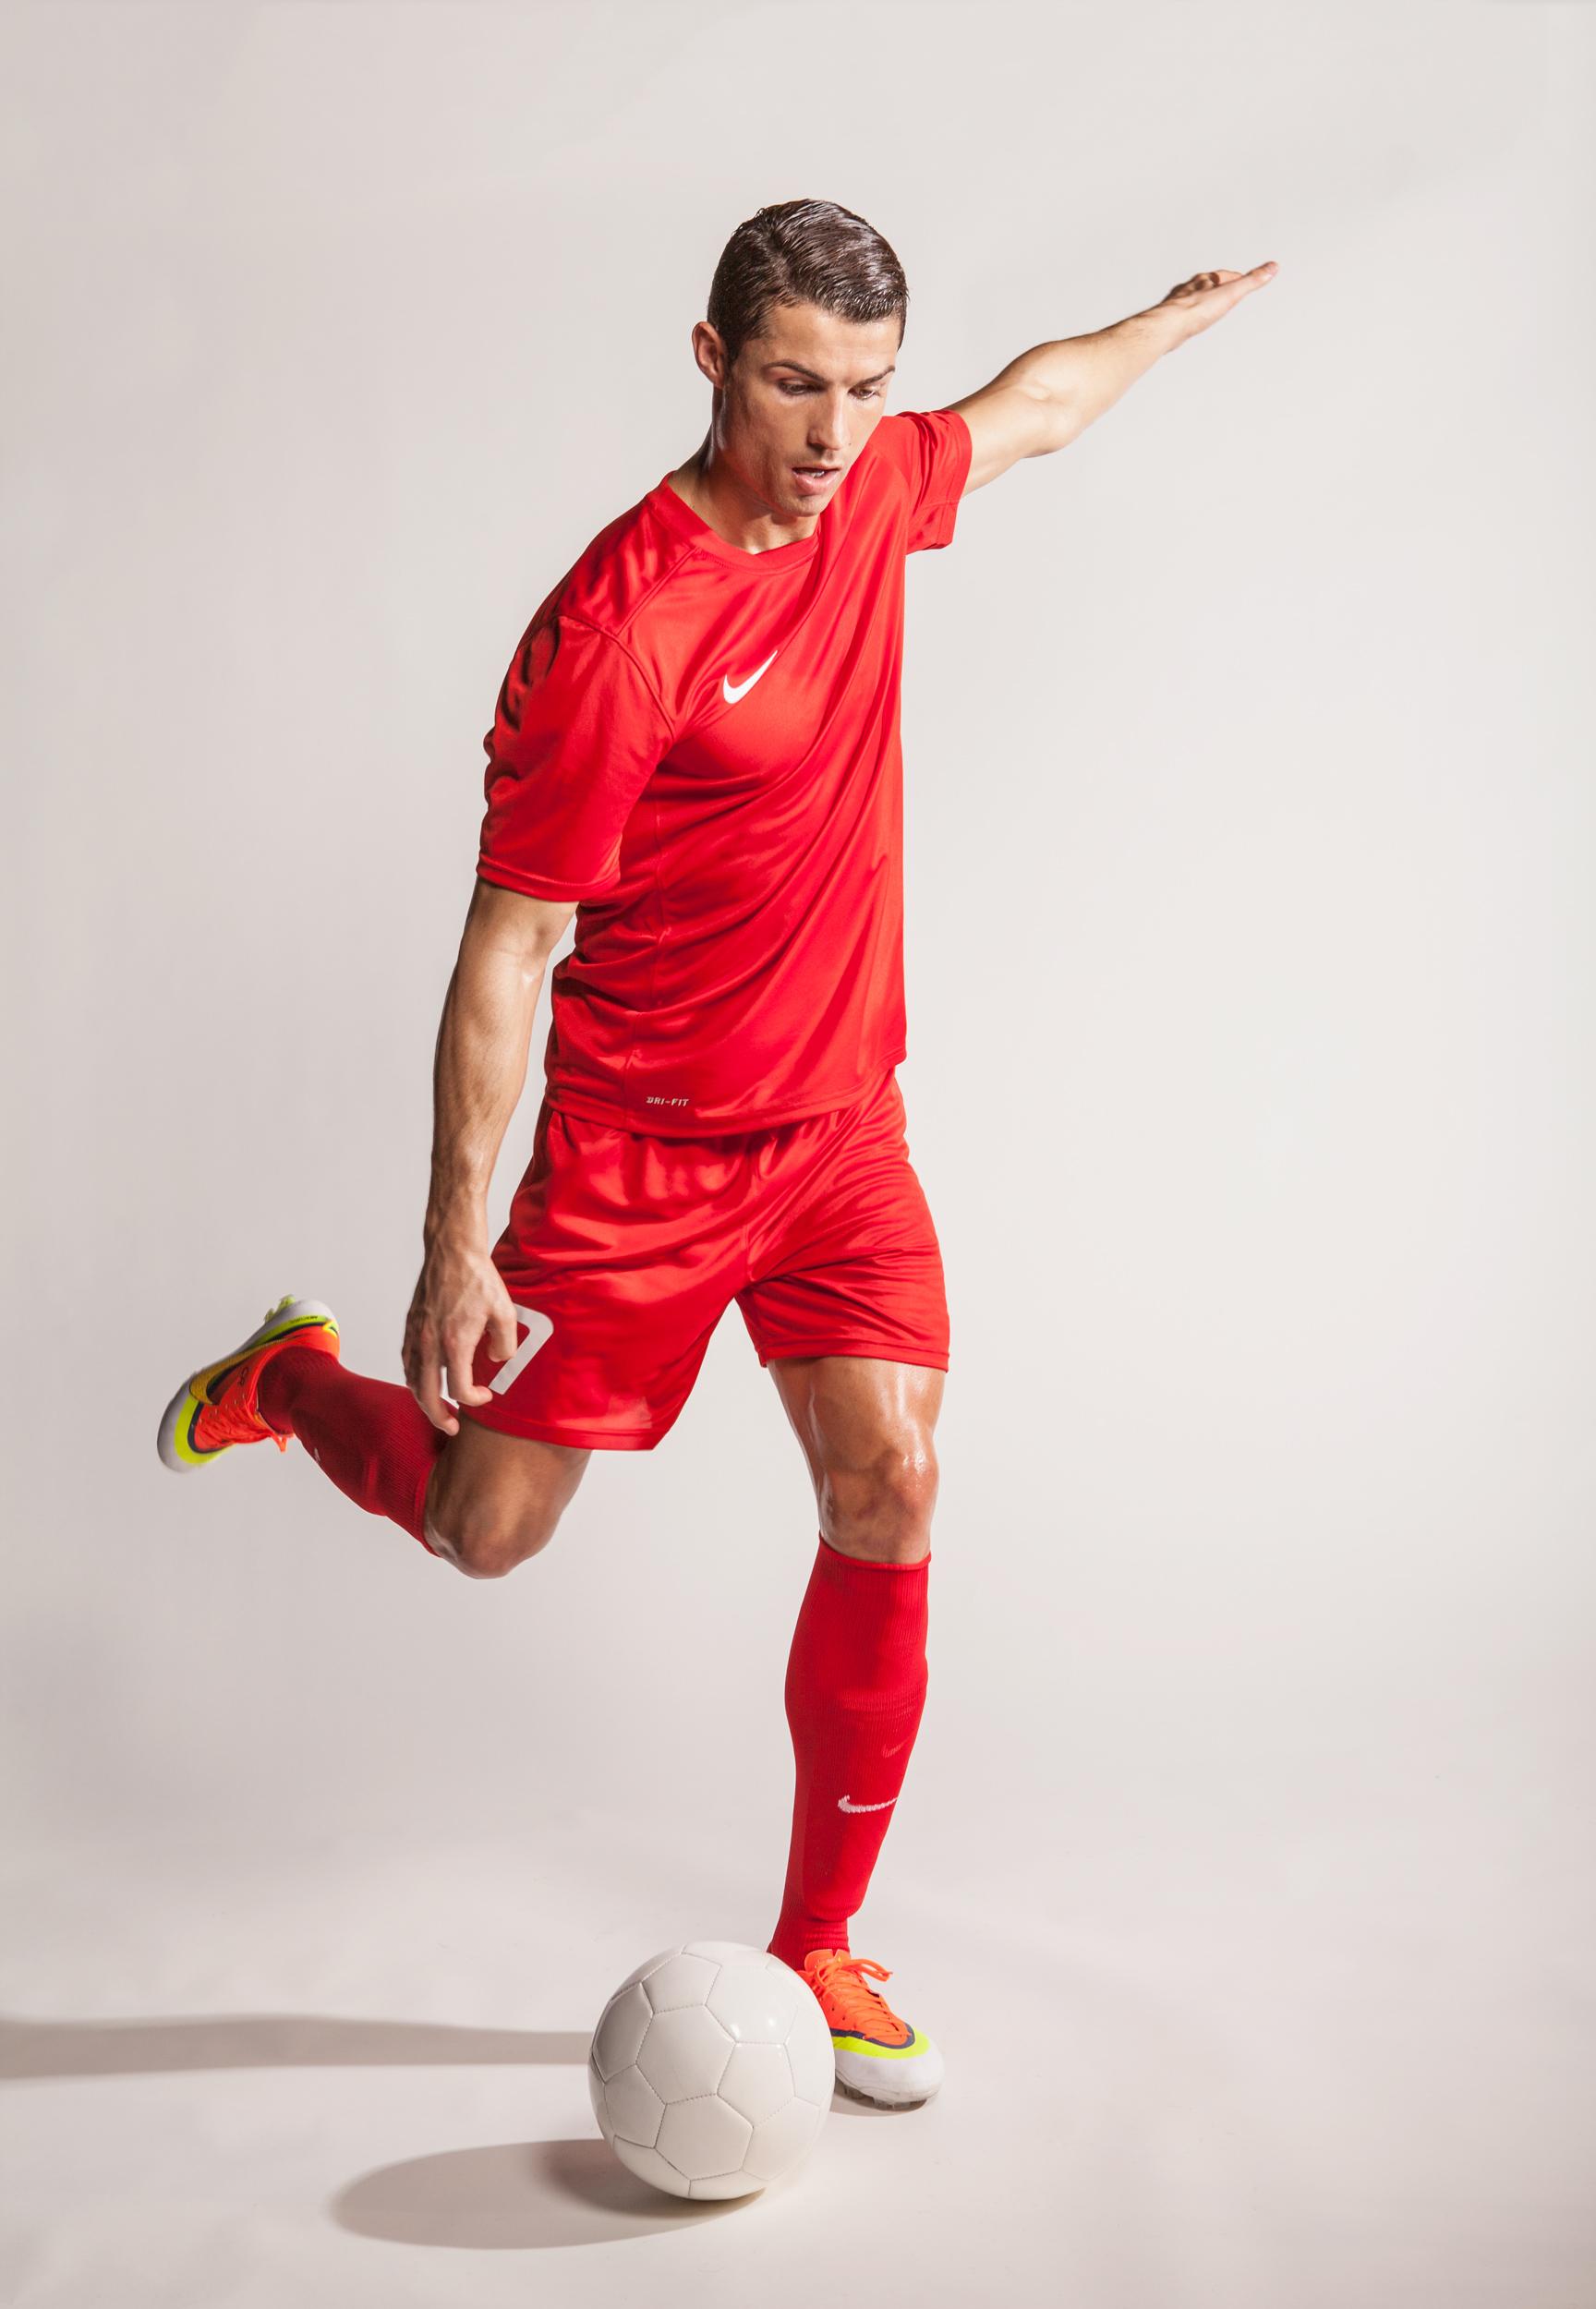 Ronaldo_figurin.jpg